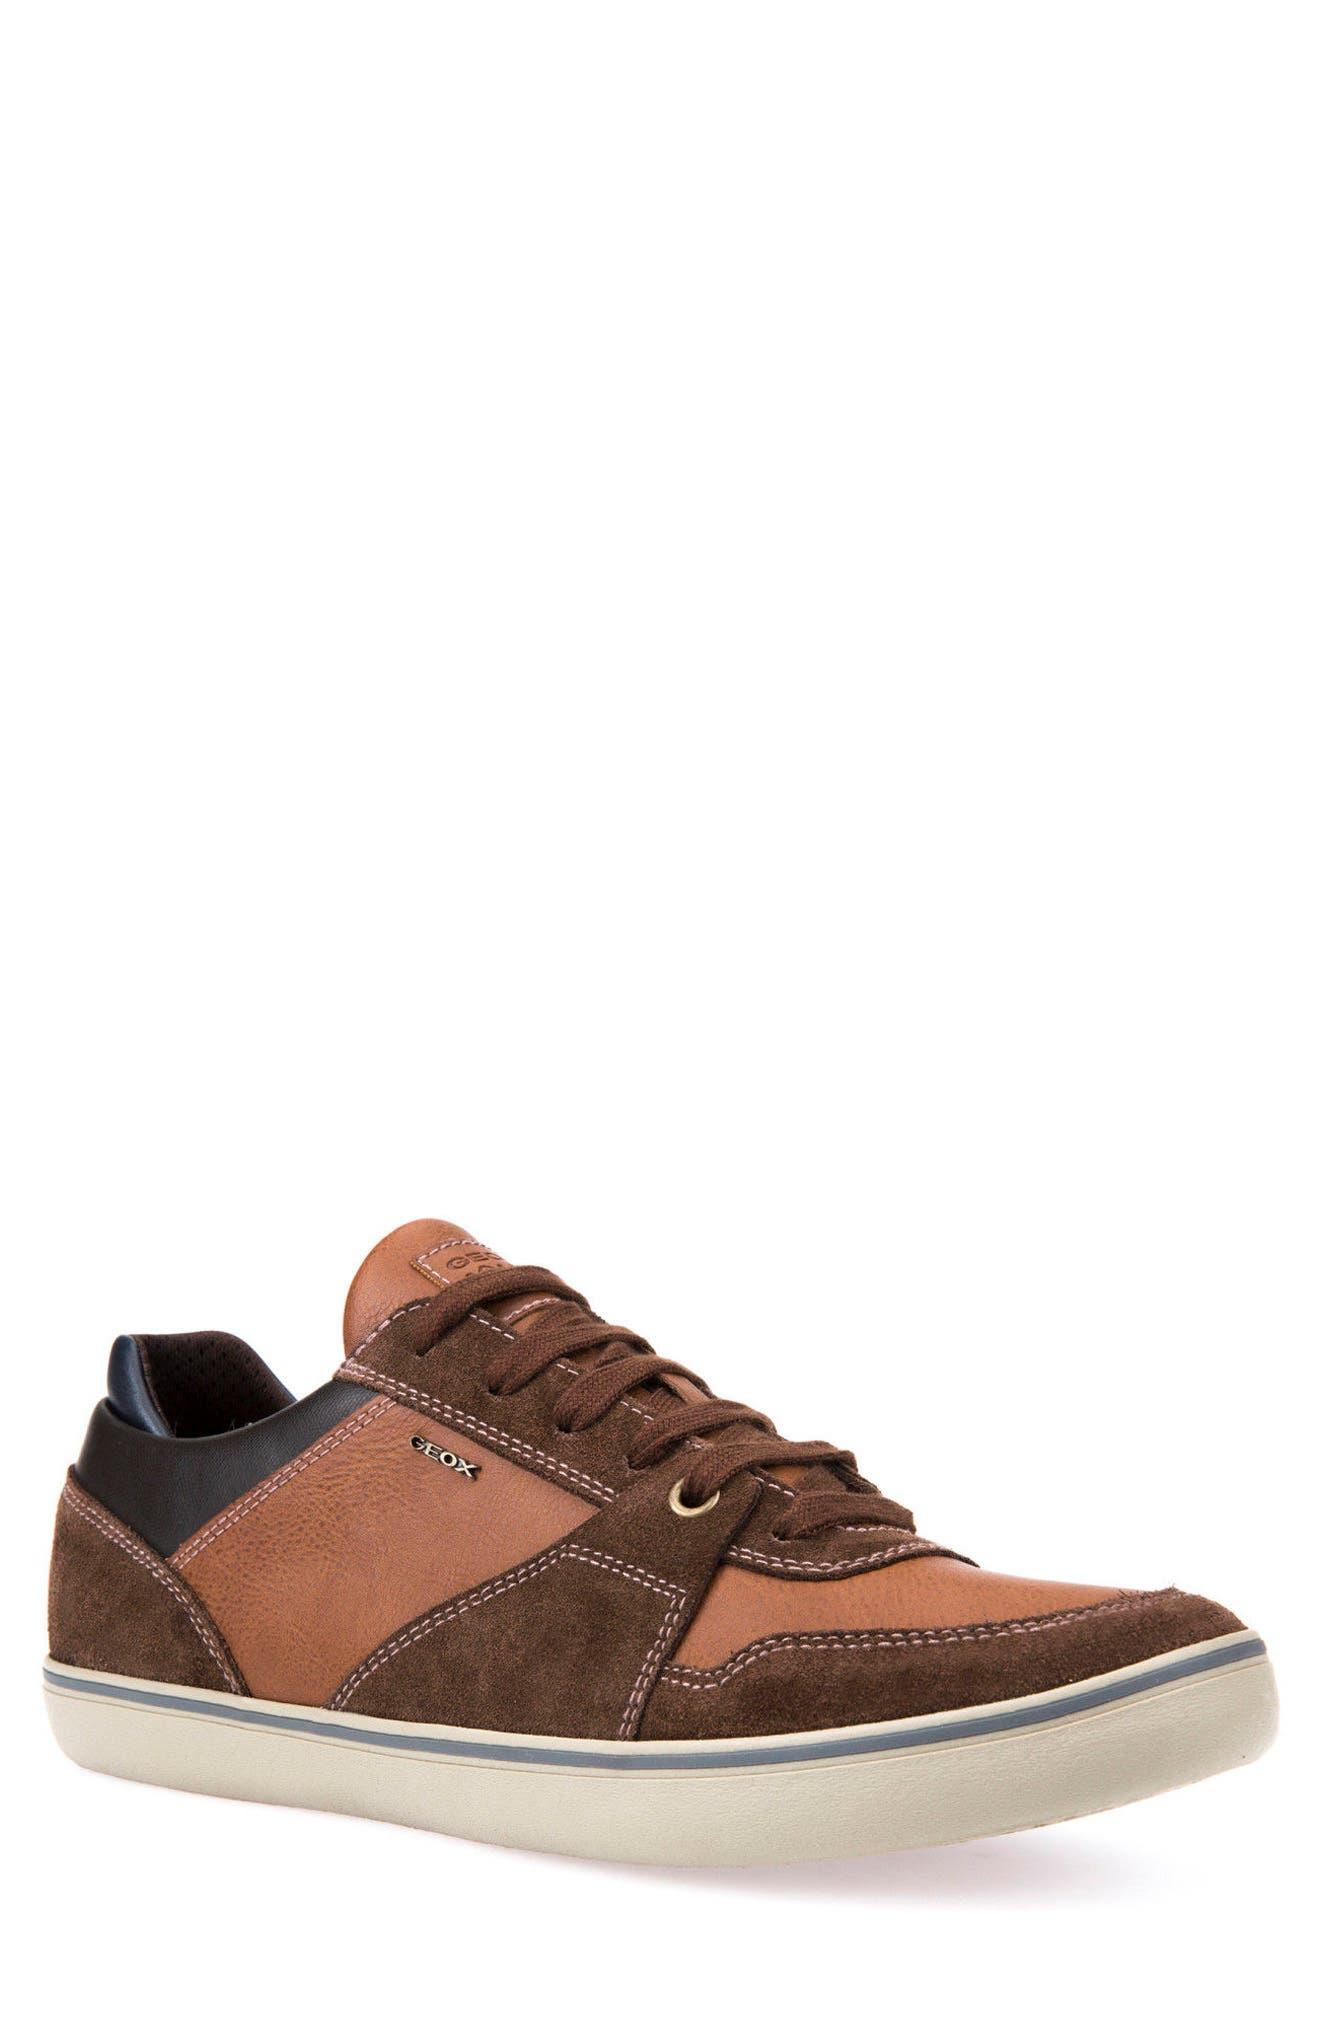 Box 27 Low-Top Sneaker,                             Main thumbnail 1, color,                             Ebony/ Brown Cotto